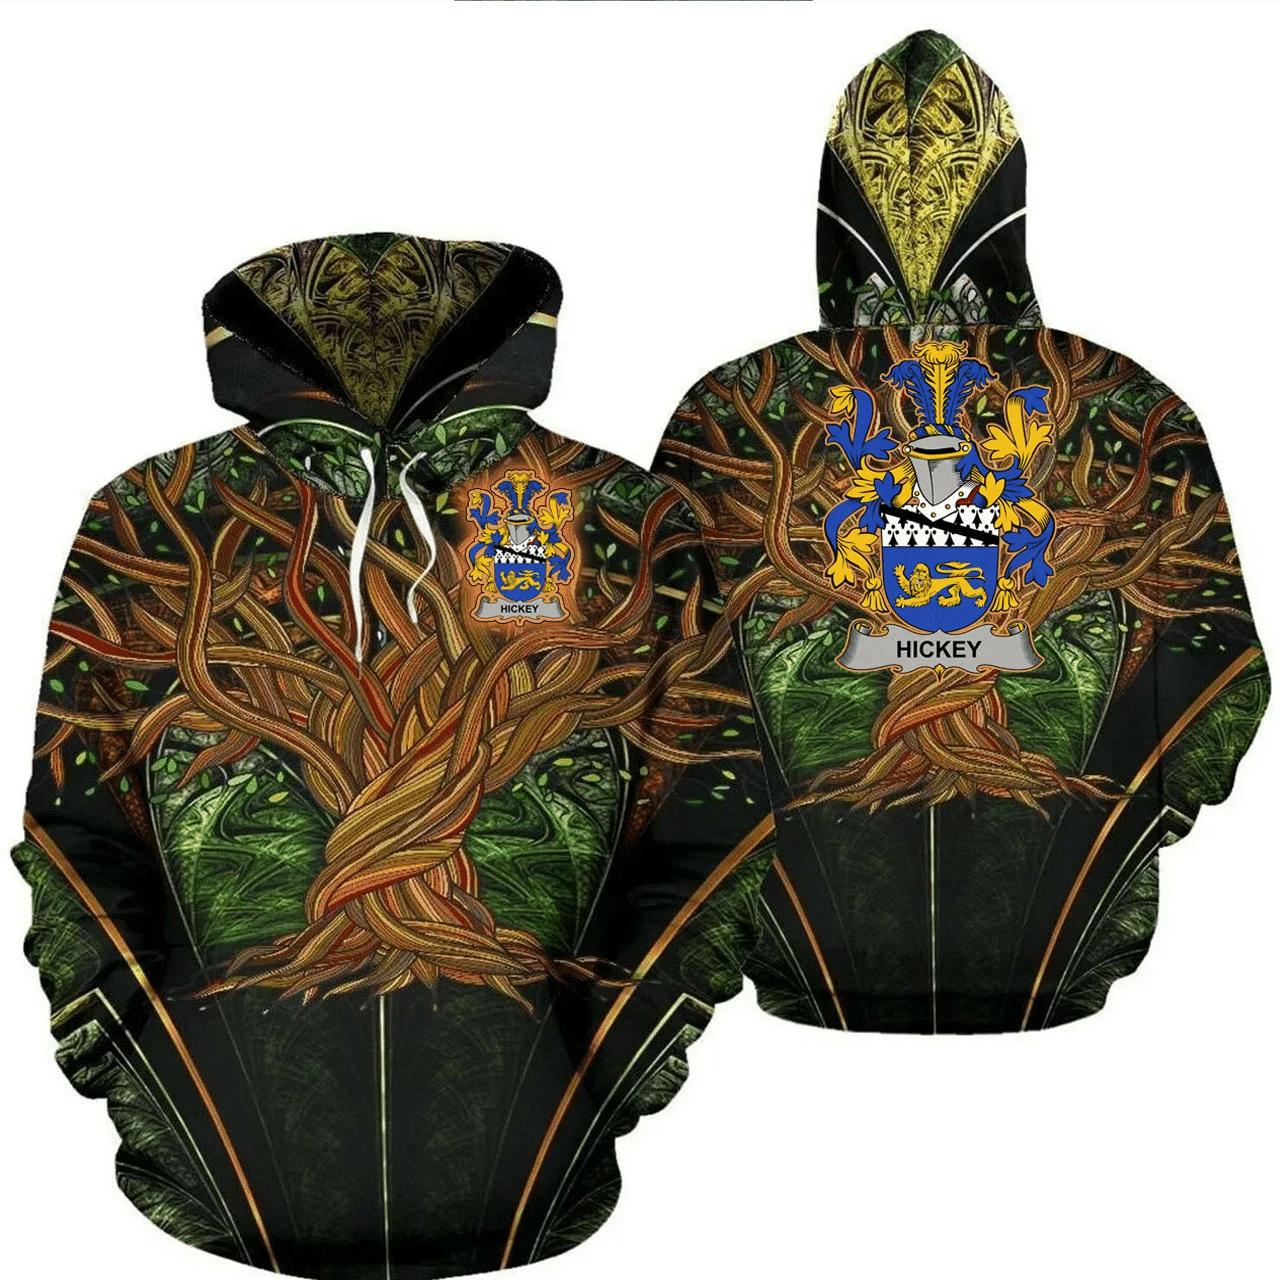 1stIreland Ireland Hoodie - Hickey or O'Hickey Irish Family Crest Hoodie - Tree Of Life A7